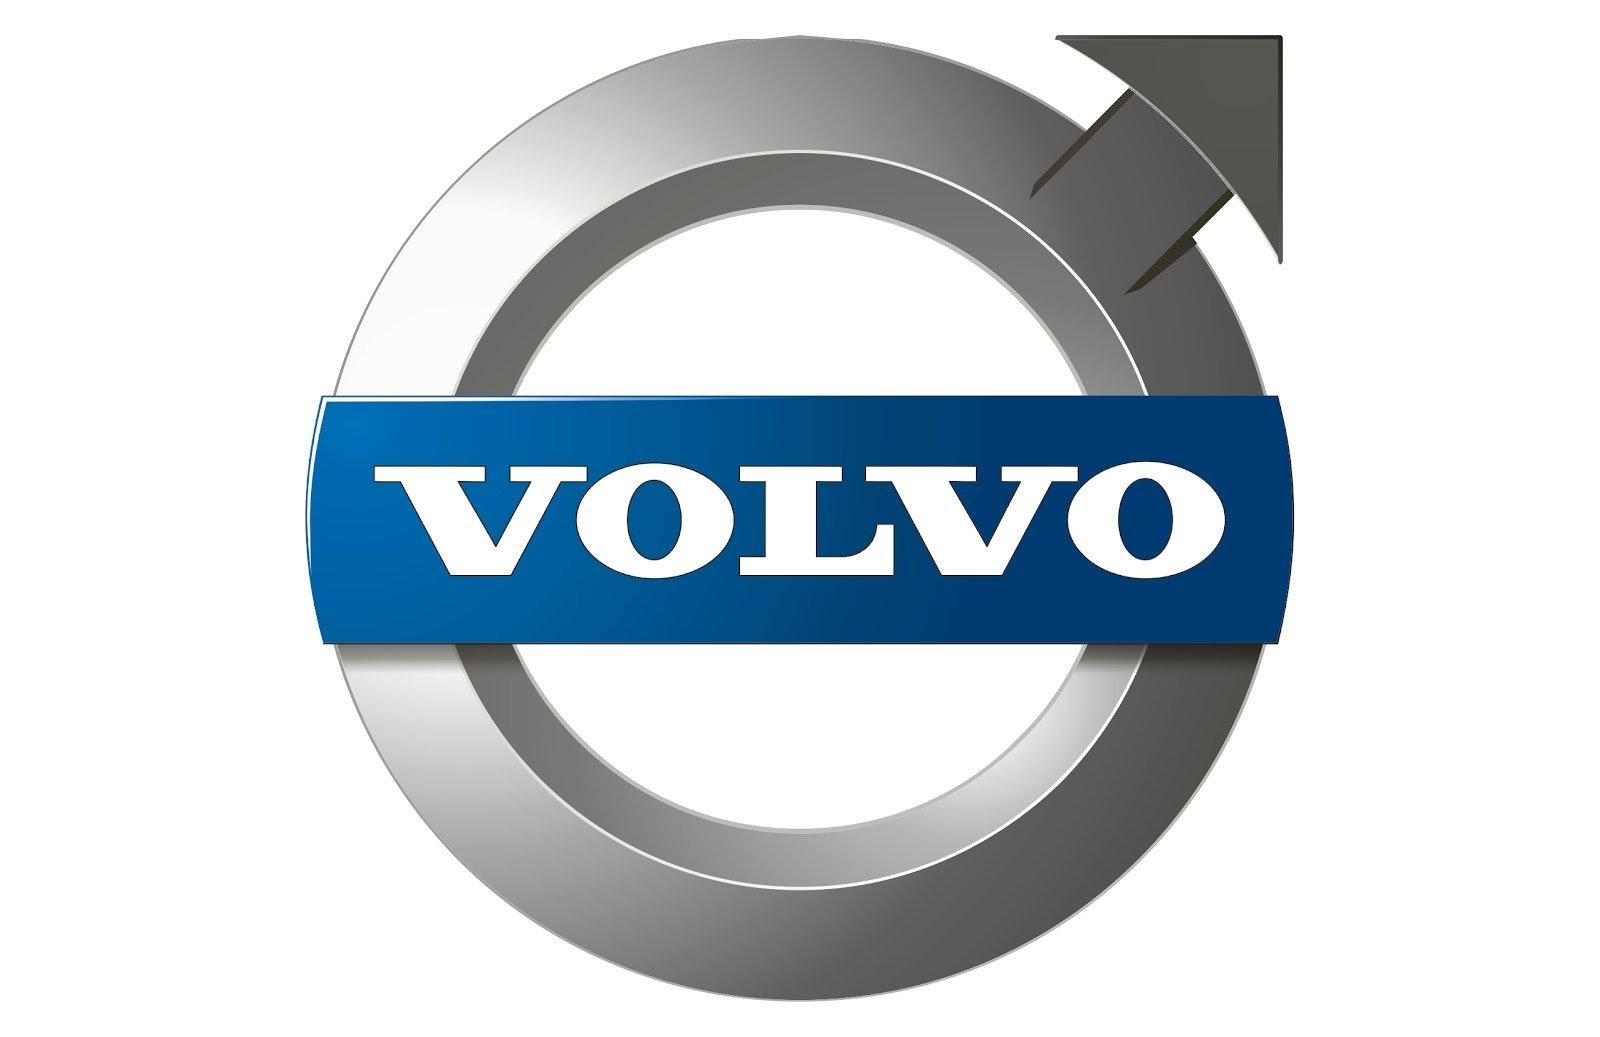 AB Volvo - Company Information